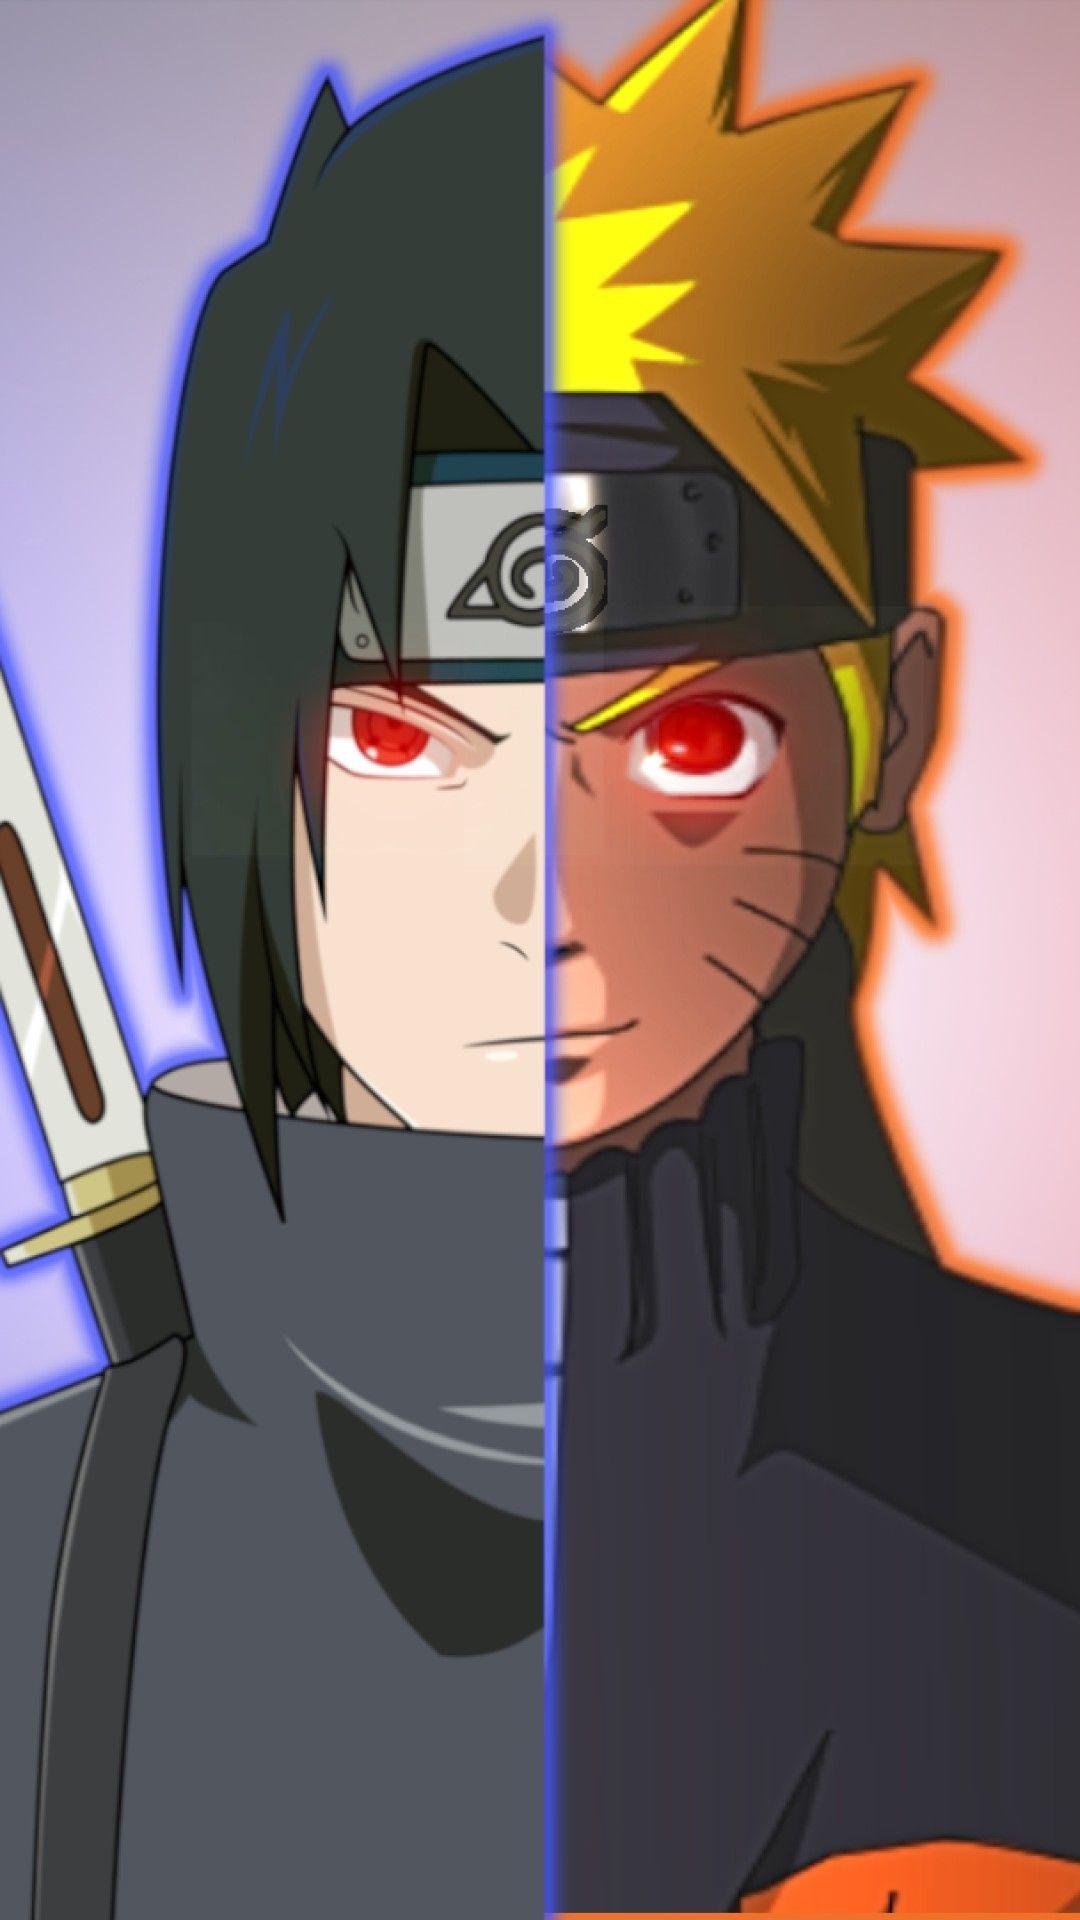 Wallpaper Phone Naruto And Sasuke Full Hd Anime Naruto Uzumaki Naruto Wallpaper